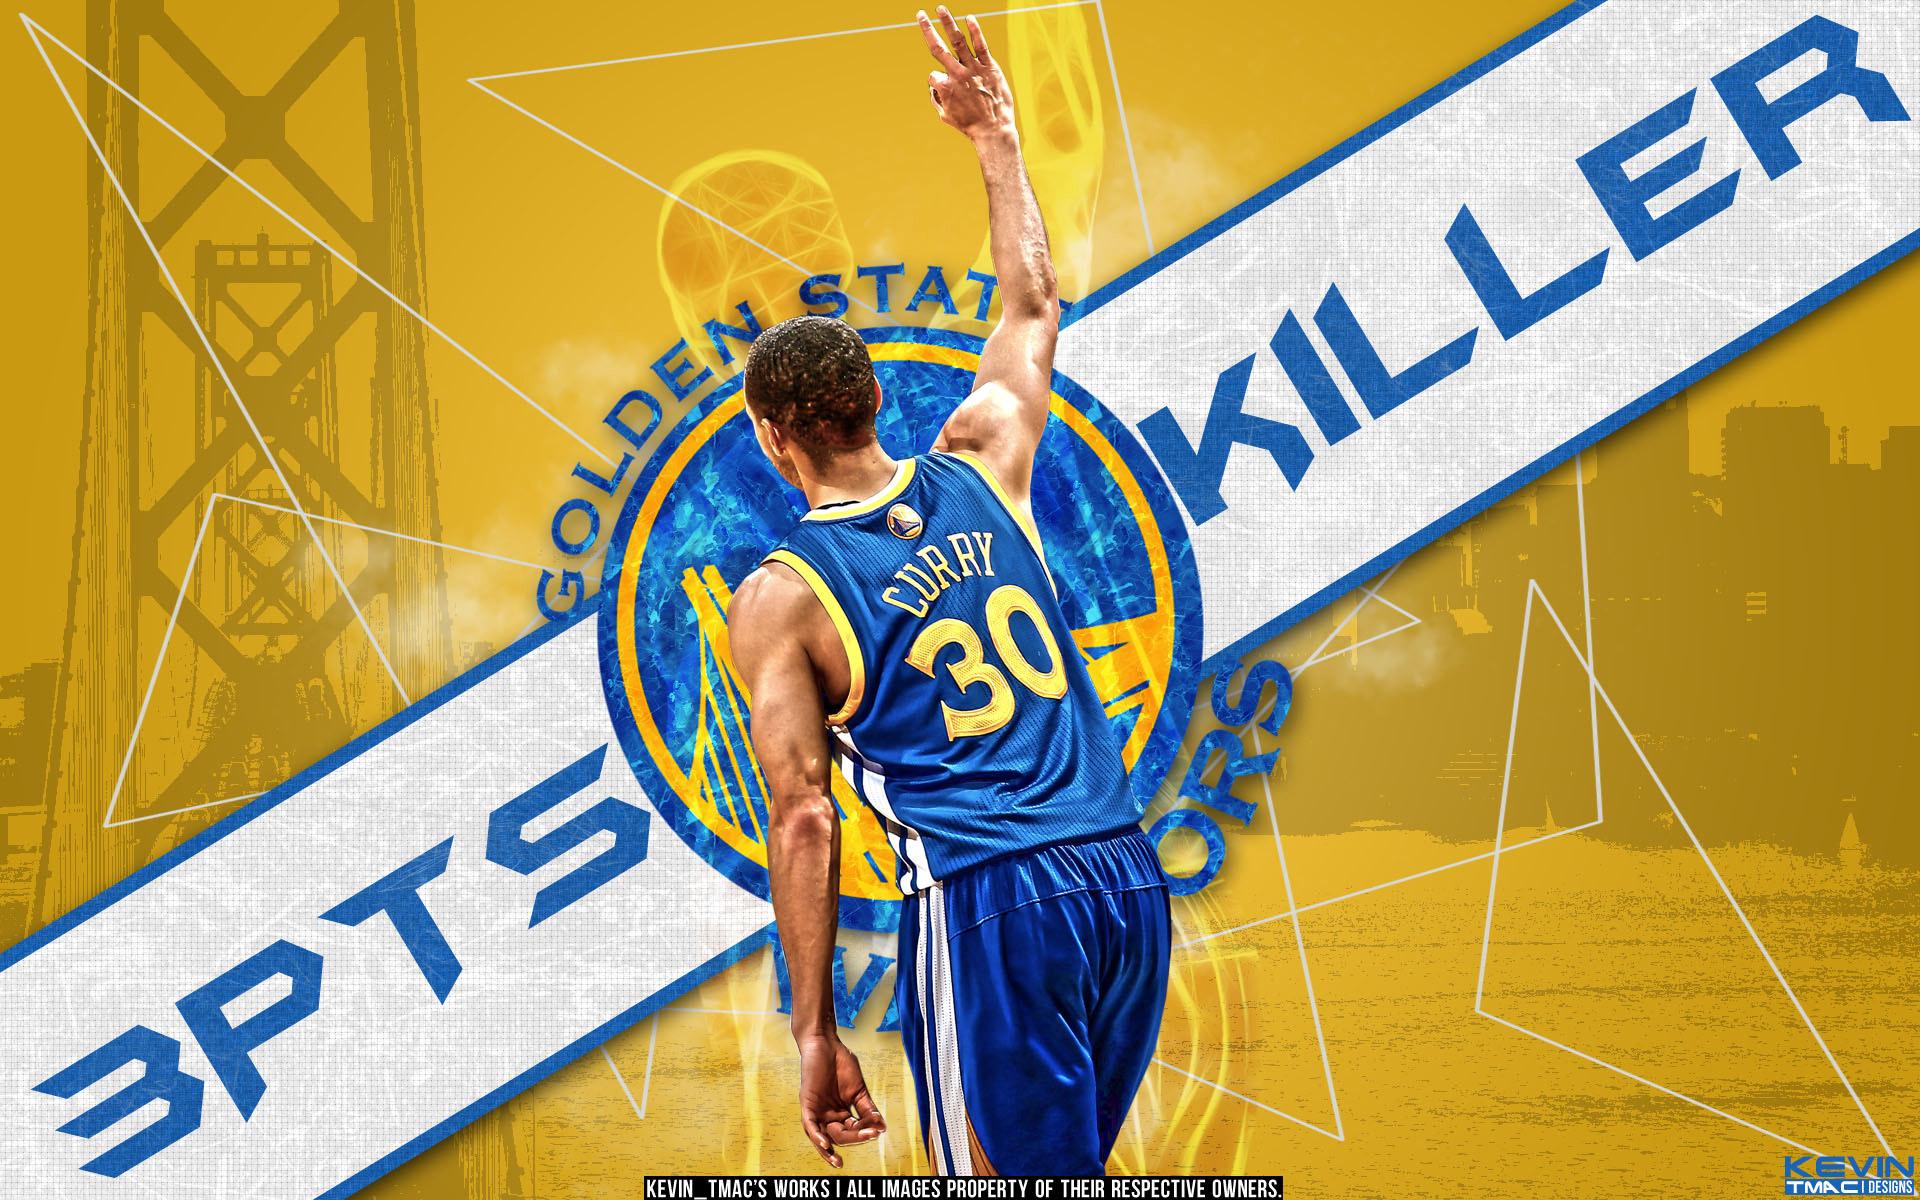 Stephen Curry 3pts Killer 1920×1200 Wallpaper | Basketball ...